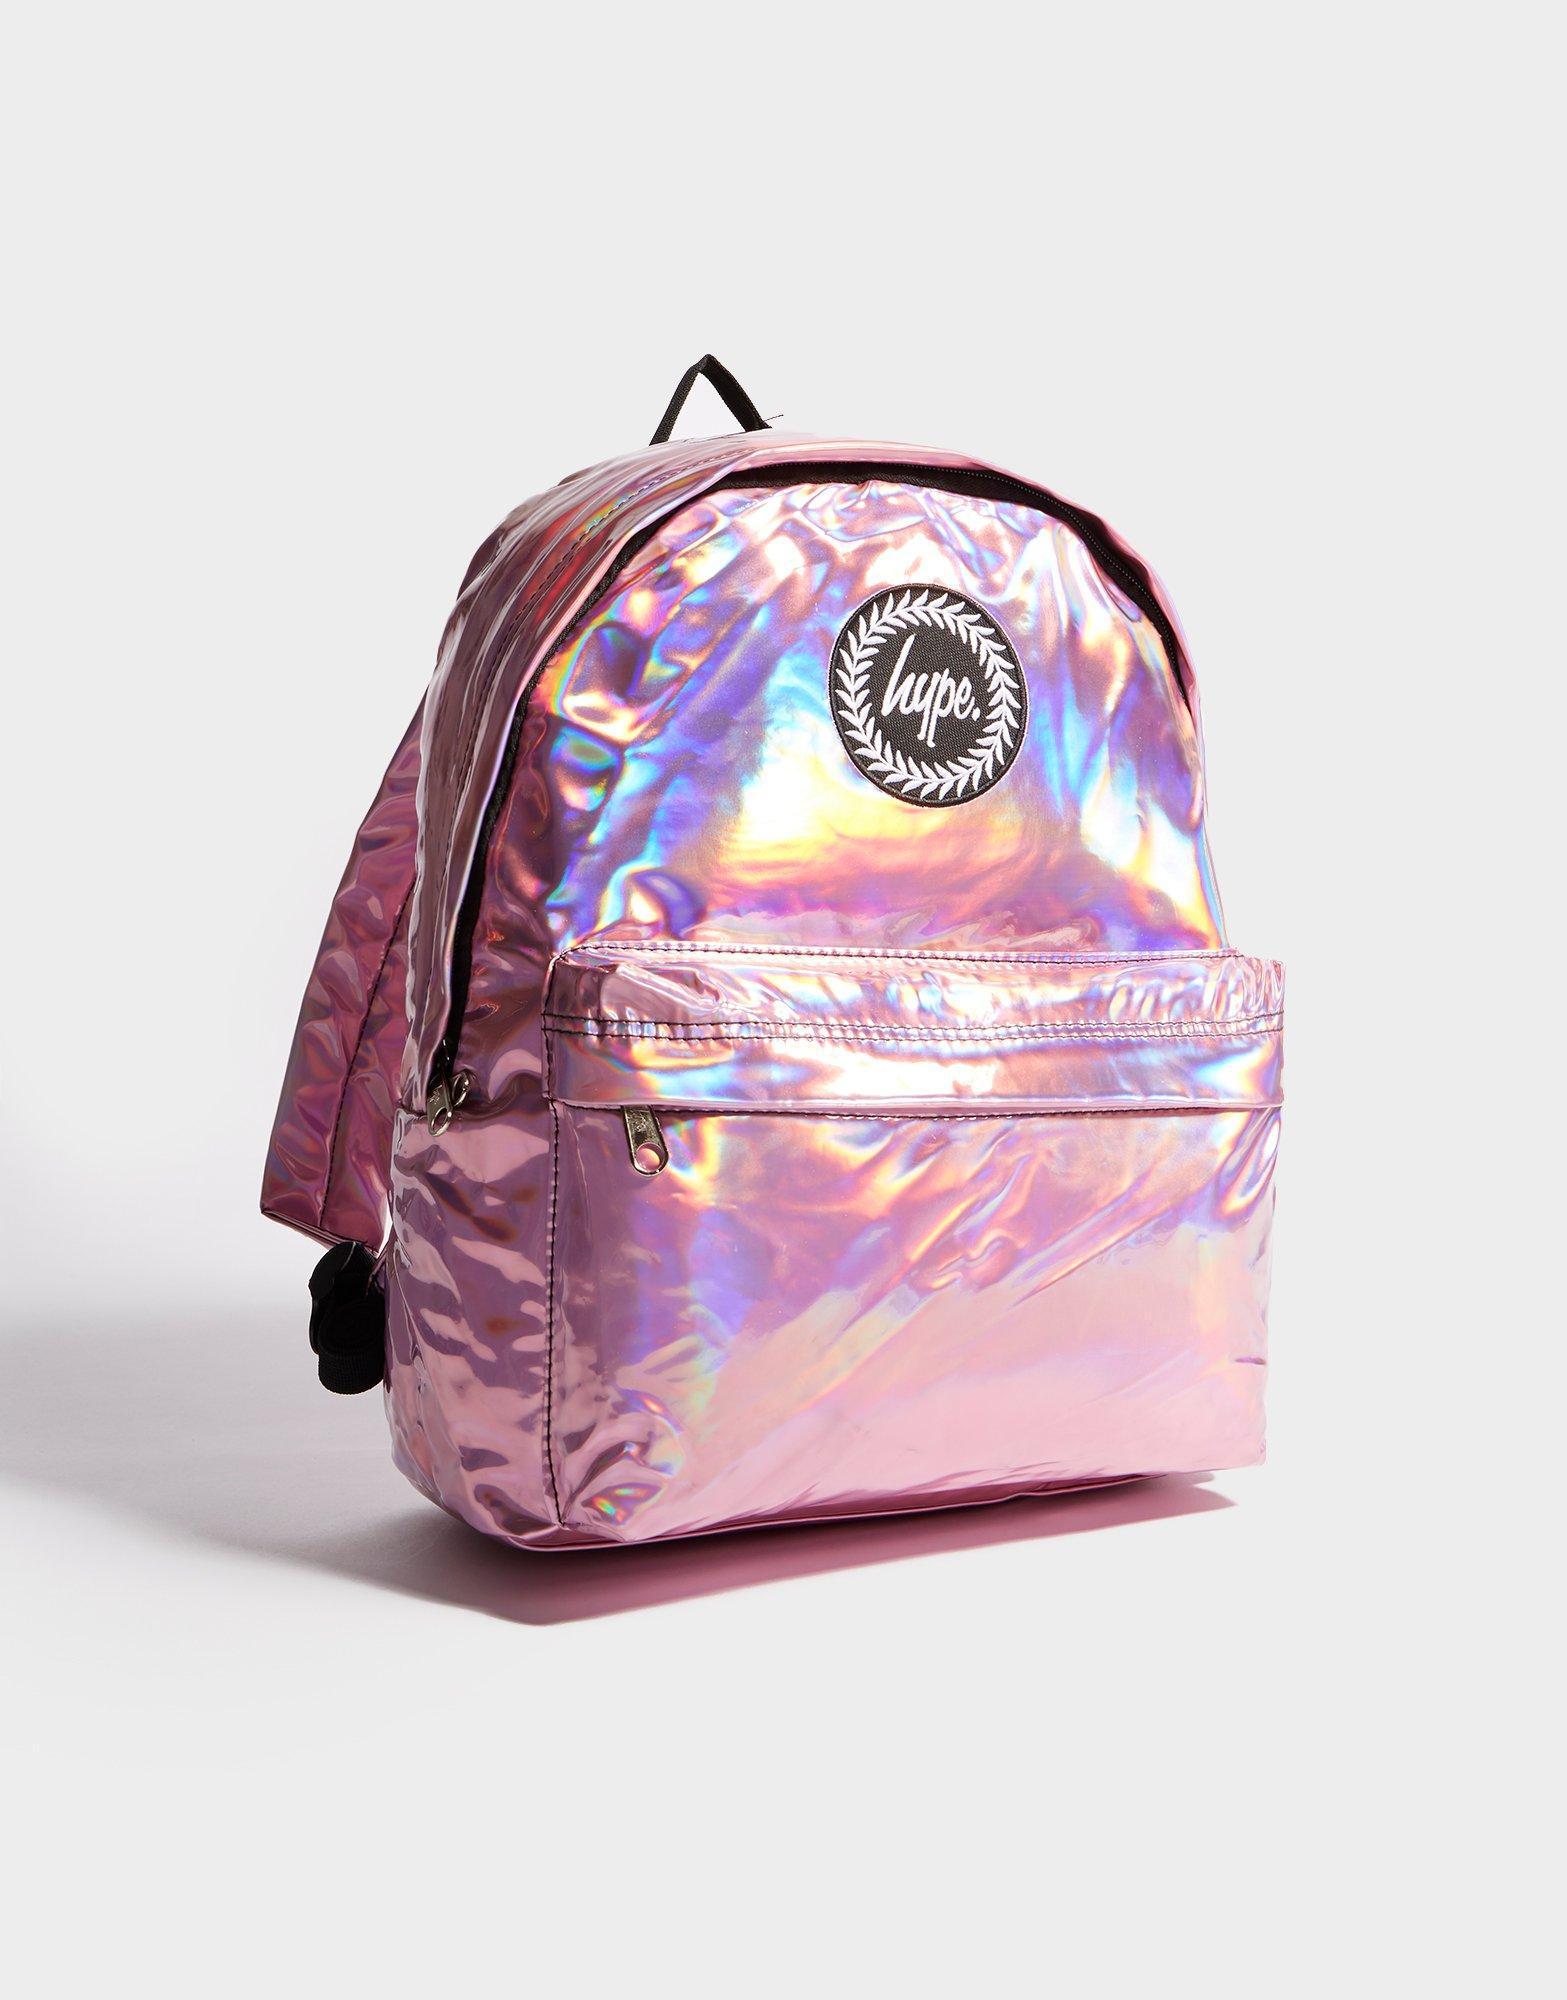 Jd Sports Hype School Bag   ReGreen Springfield 5f5a9c1c40